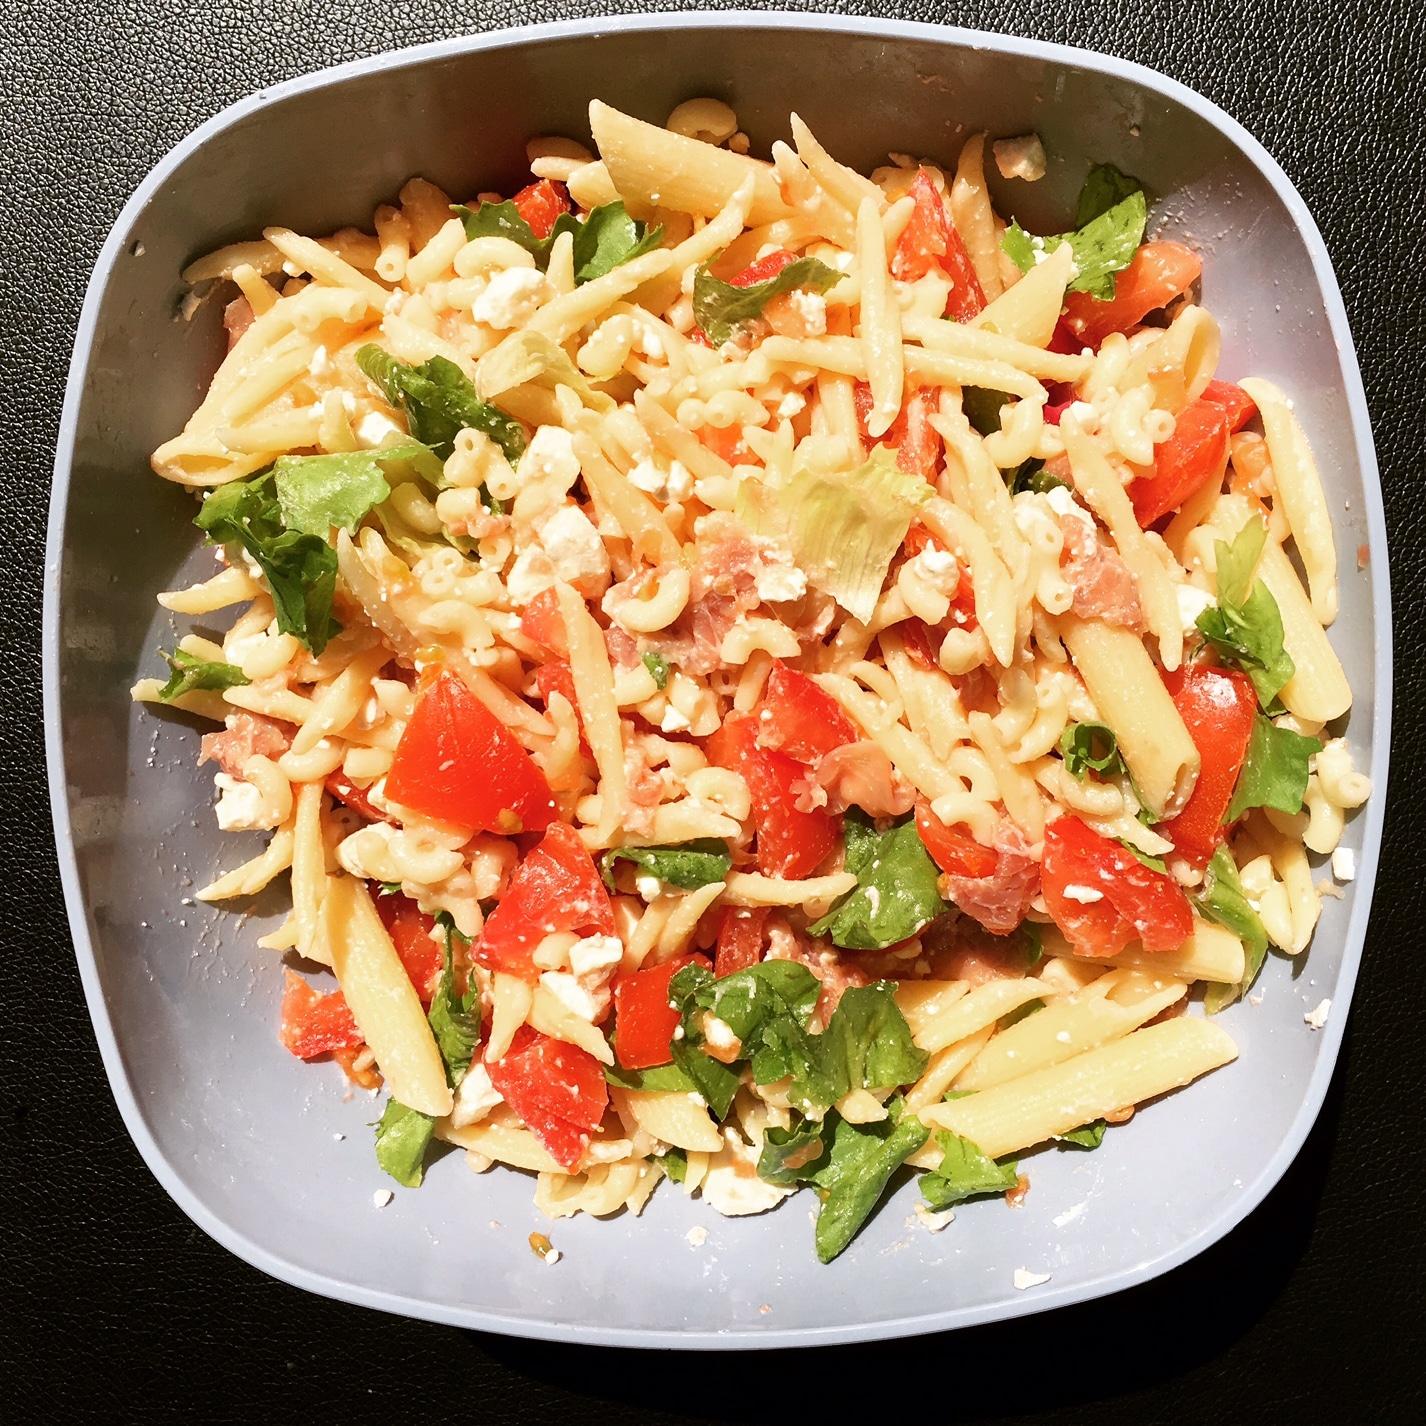 salade de pates a l'italienne